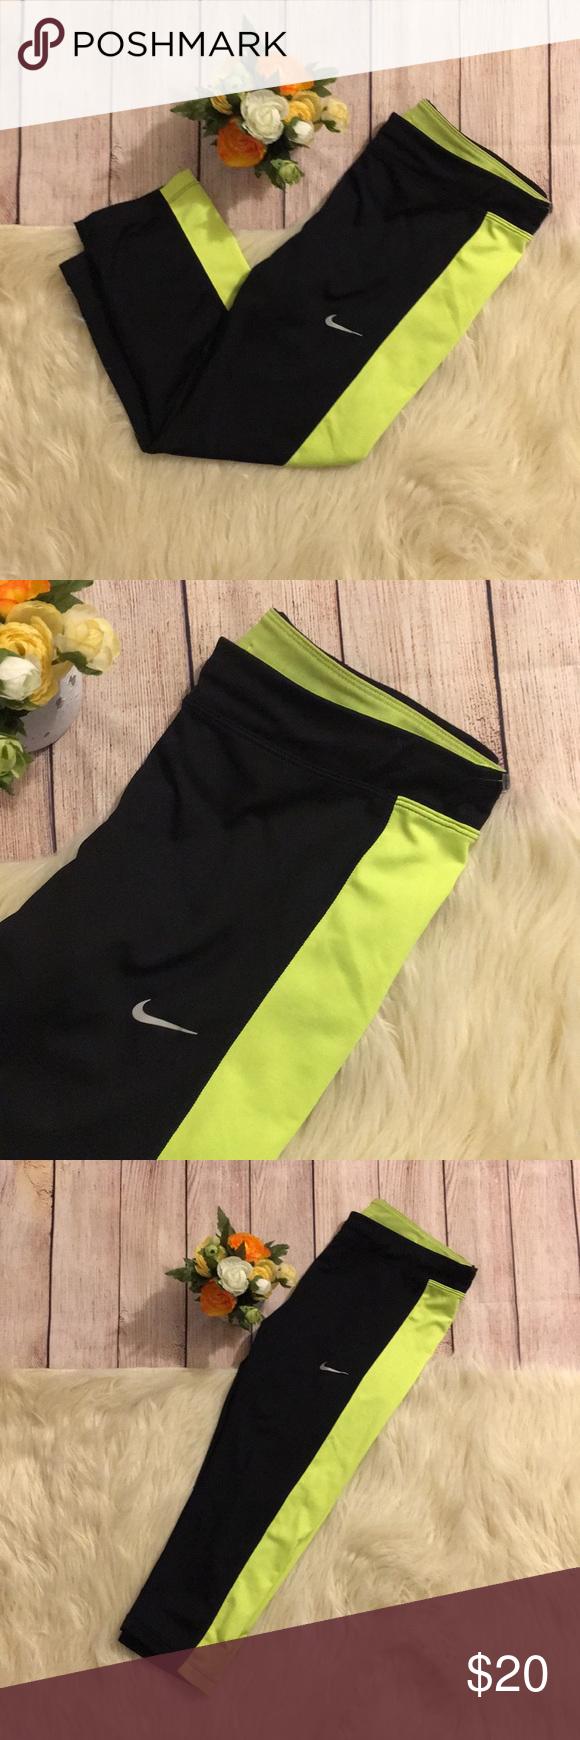 Nike Dri Fit Capri Yoga Leggings | Yoga leggings, Nike dri ...